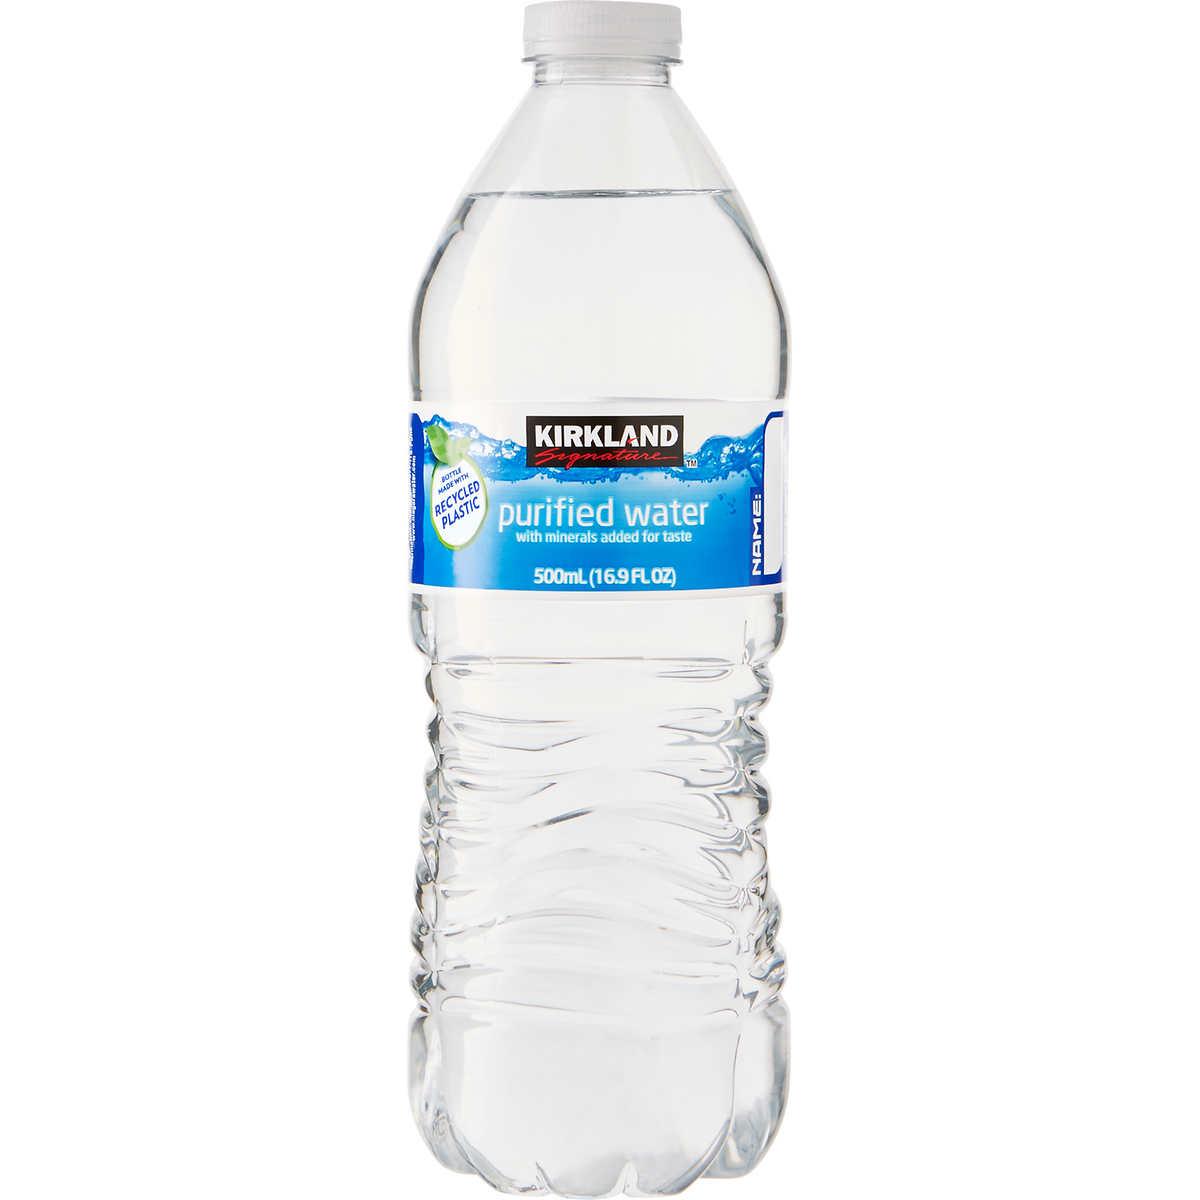 Purifying Drinking Water Kirkland Signature Purified Drinking Water 169 Oz 40 Ct